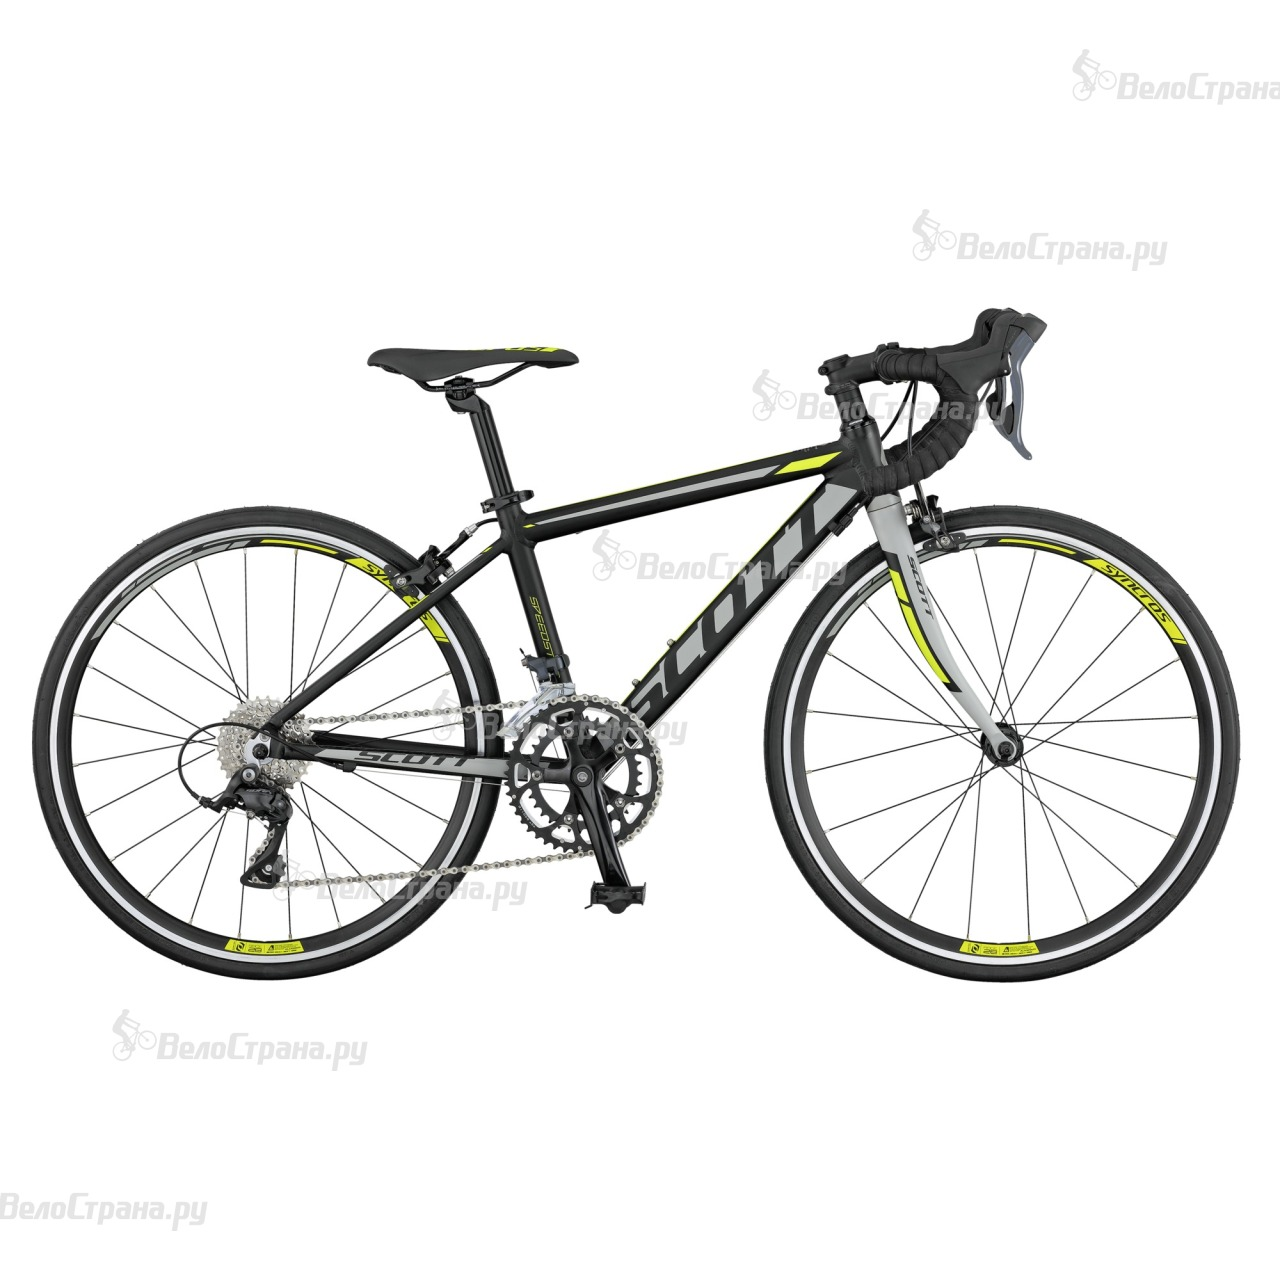 Велосипед Scott Speedster 40 (24) (2017)